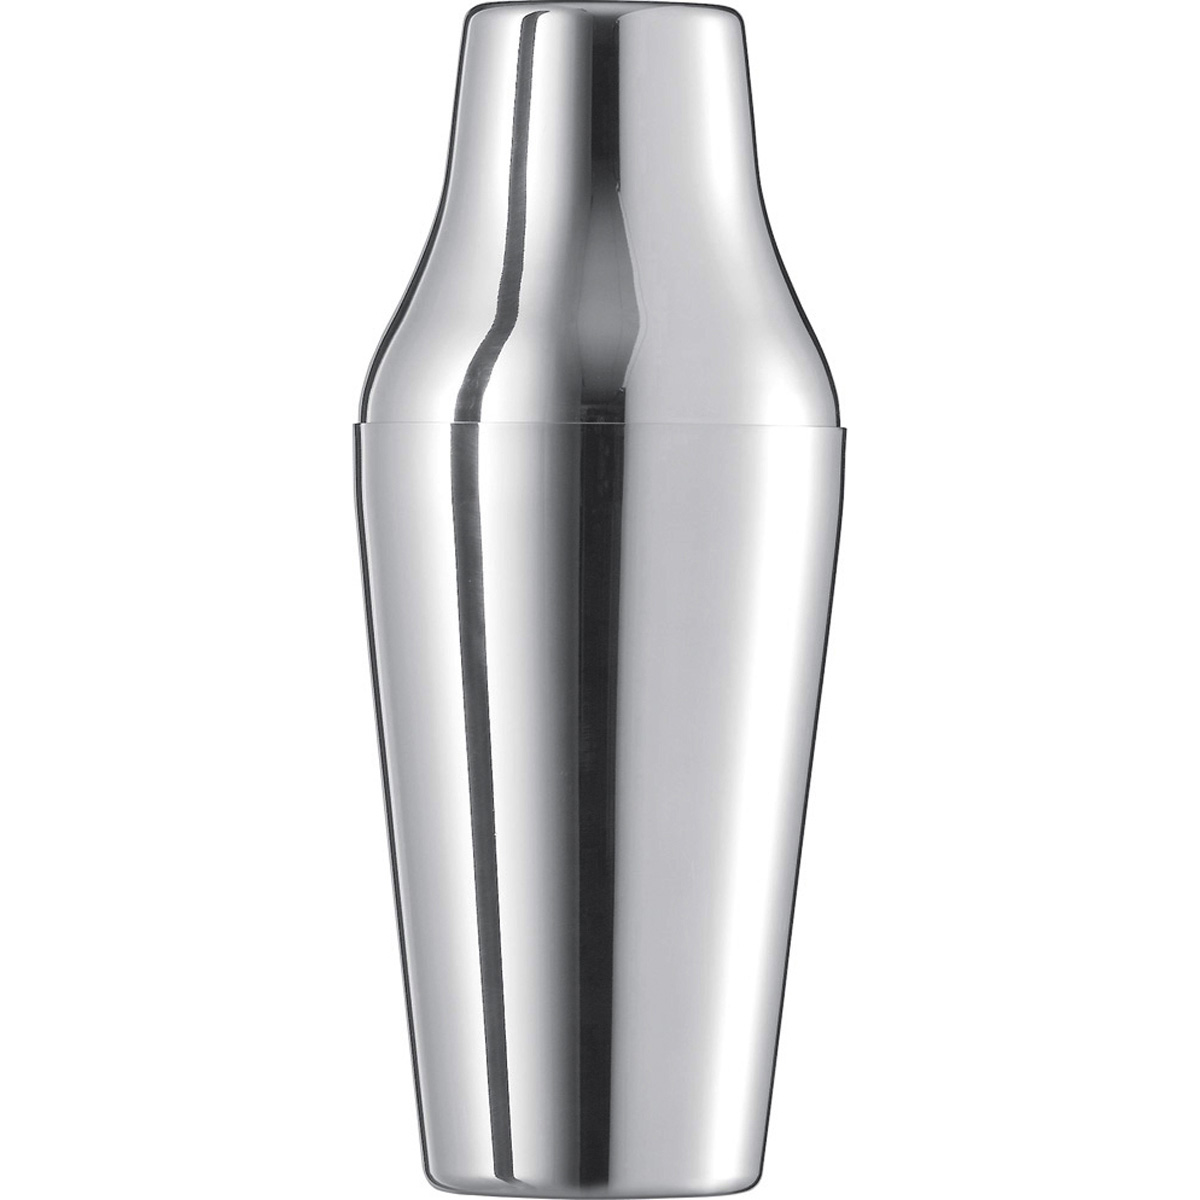 Ray's Basic Bar Metal Shaker